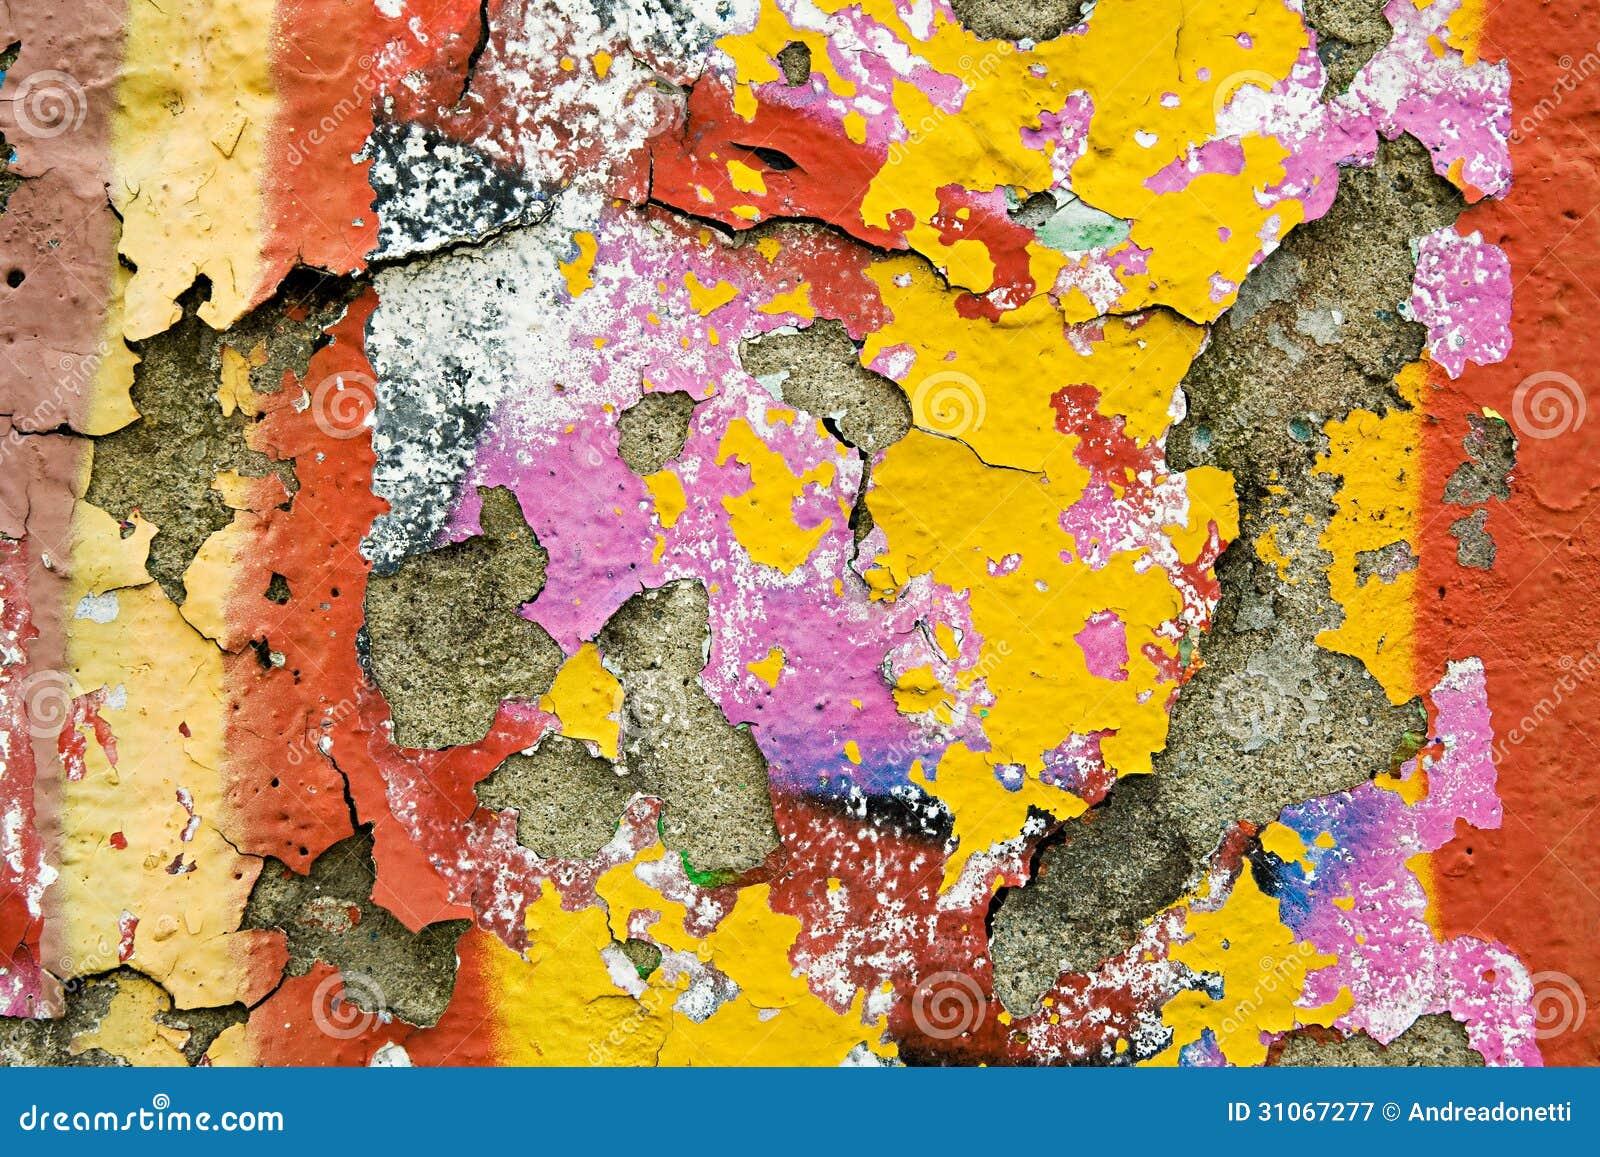 peeling paint royalty free - photo #49